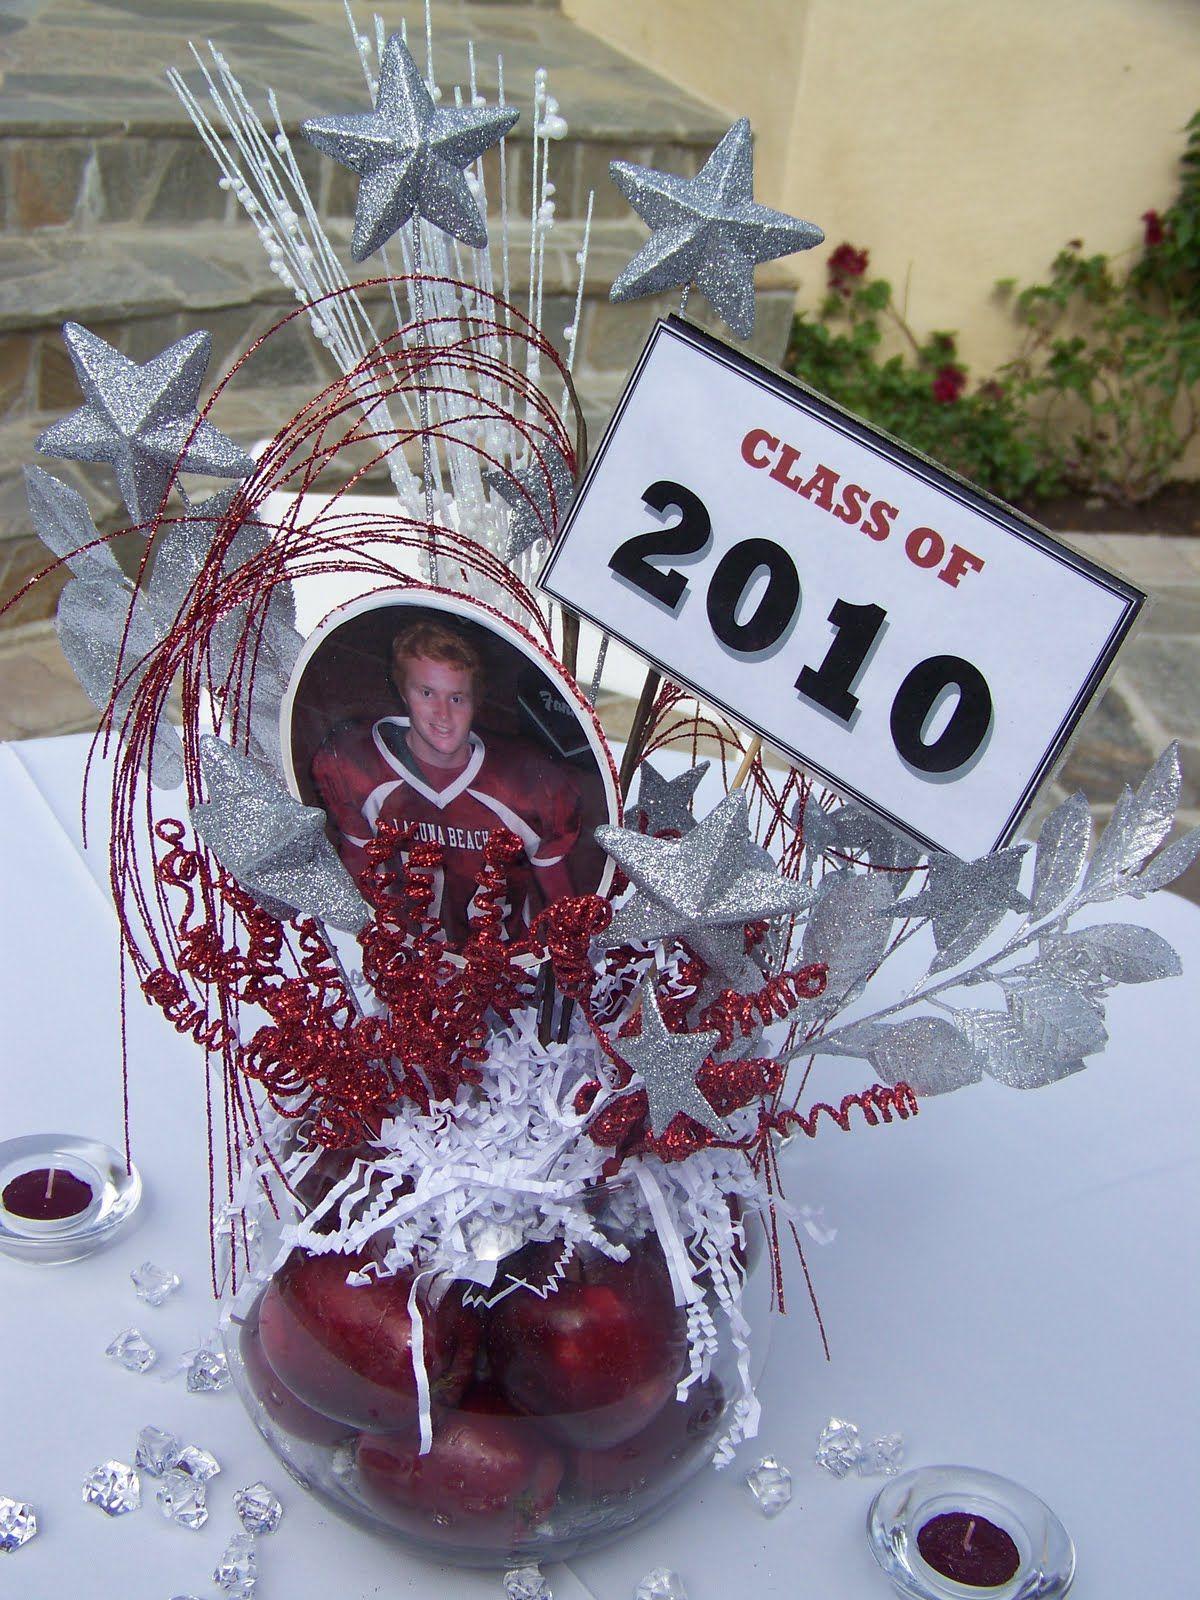 High School Graduation Memory Table Idea Decorations Http Jenniferstonebarger